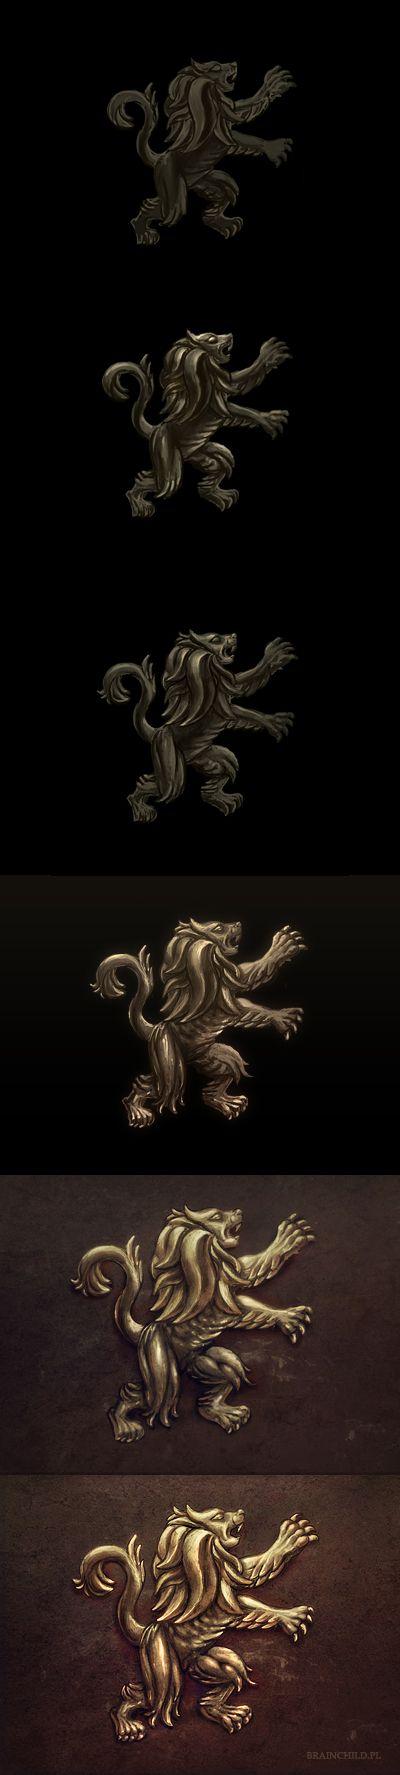 stepbystep_lion.jpg 400×1,775 pixels